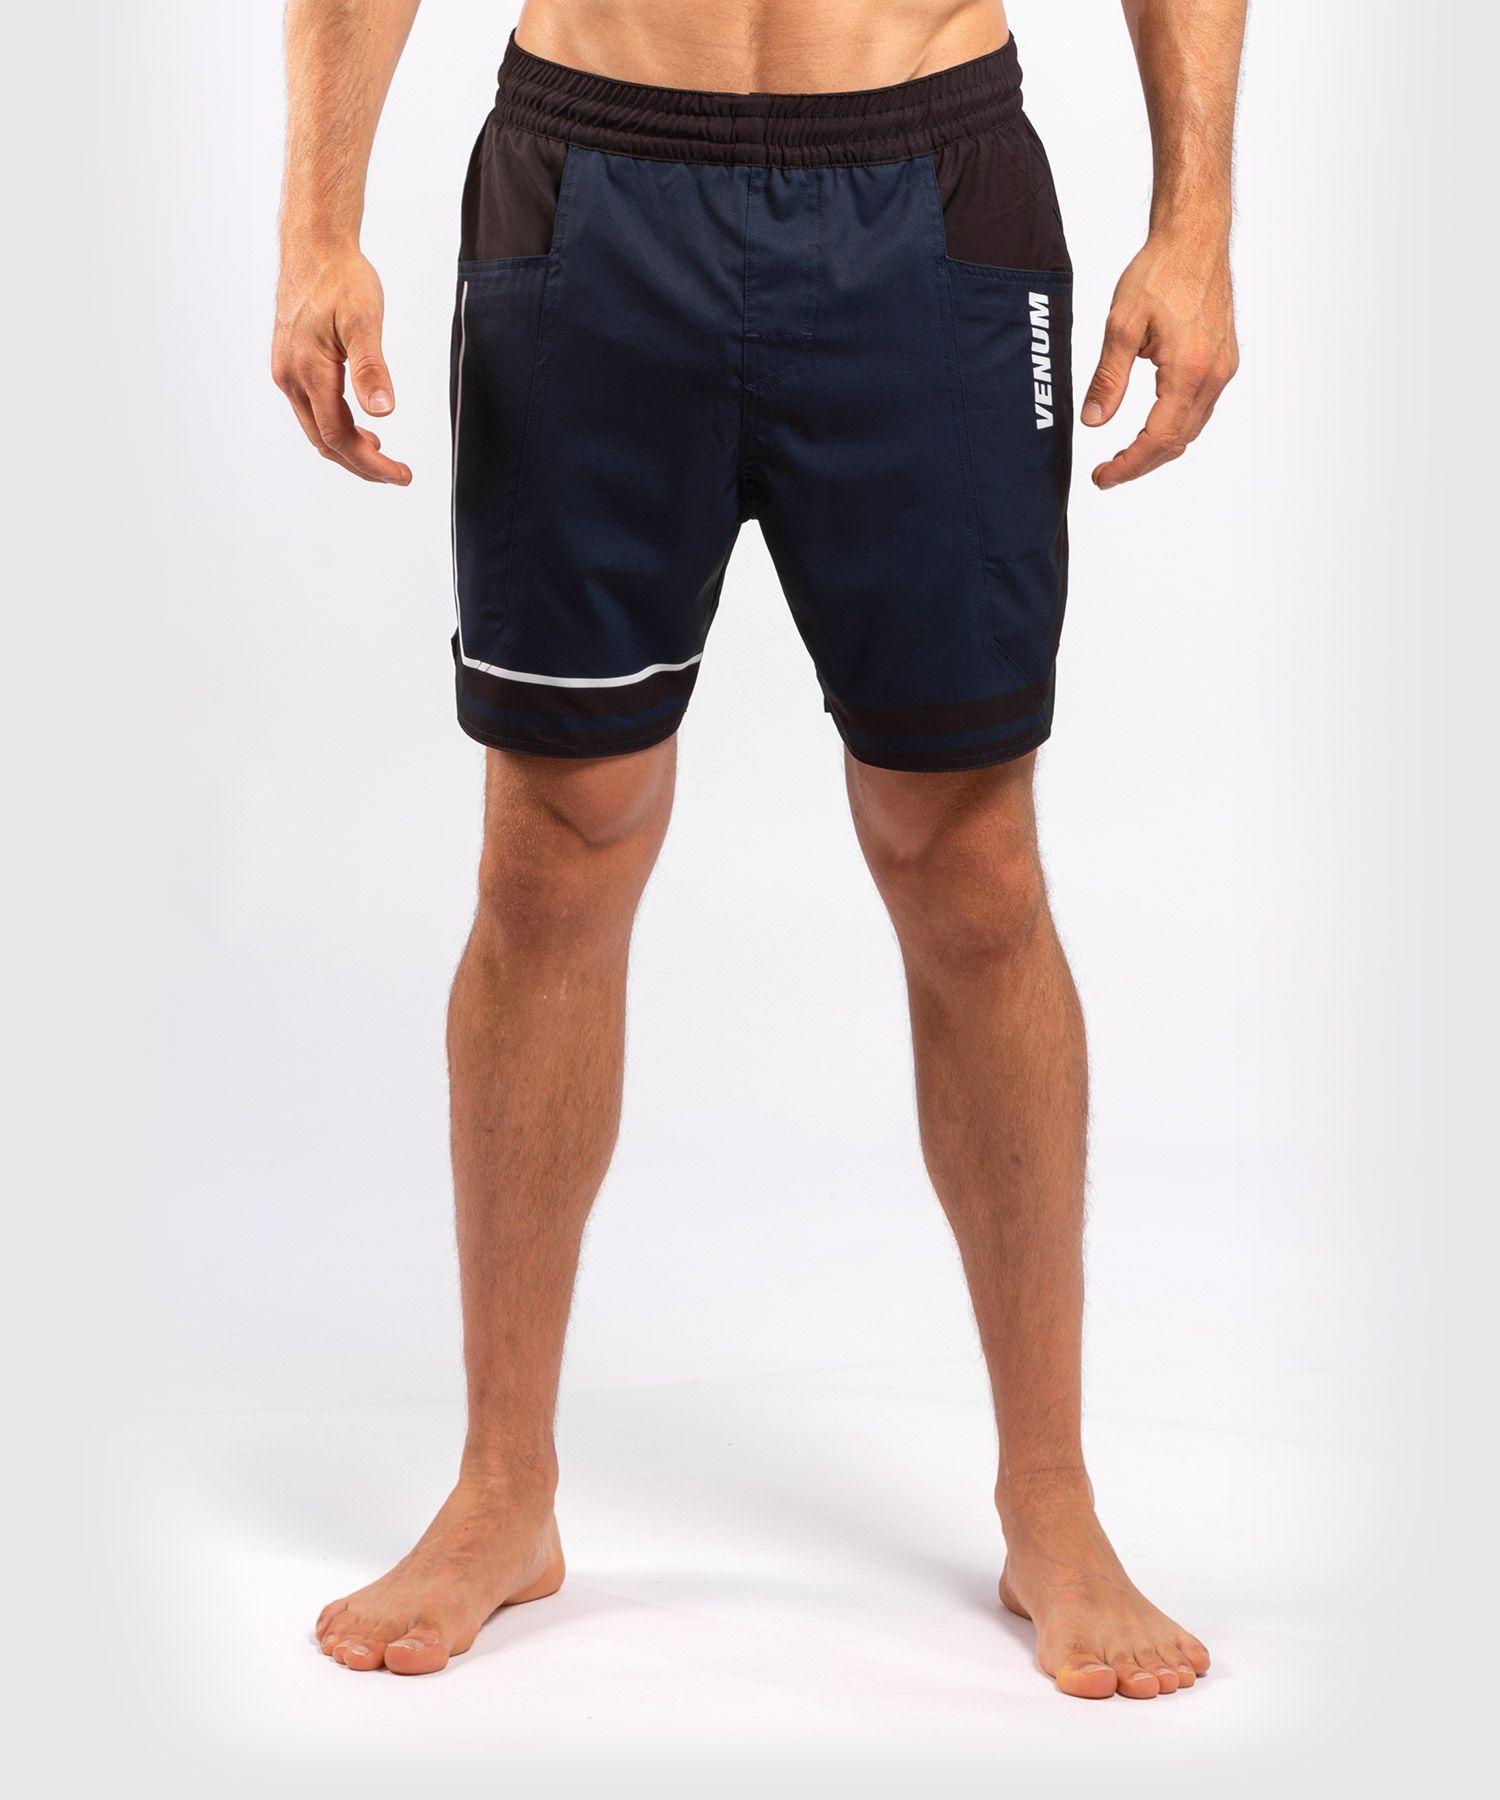 Venum Bali Boardshort – Navy Blue